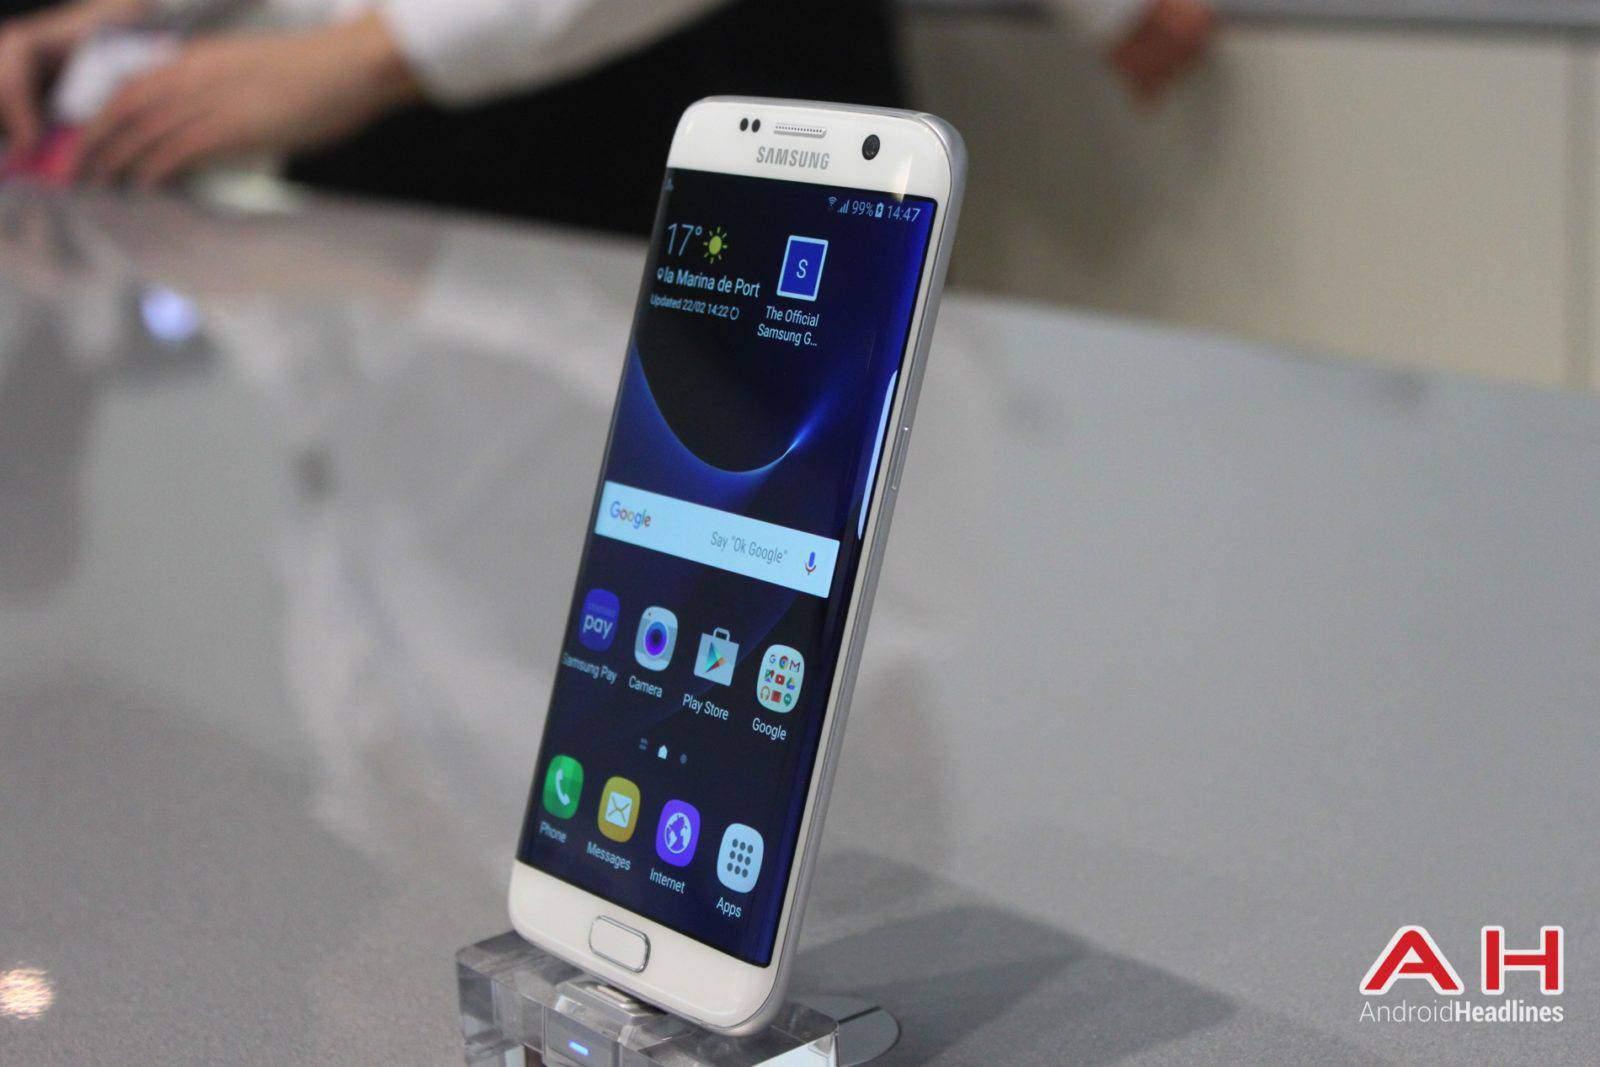 Galaxy S7 Edge MWC Booth AH 18